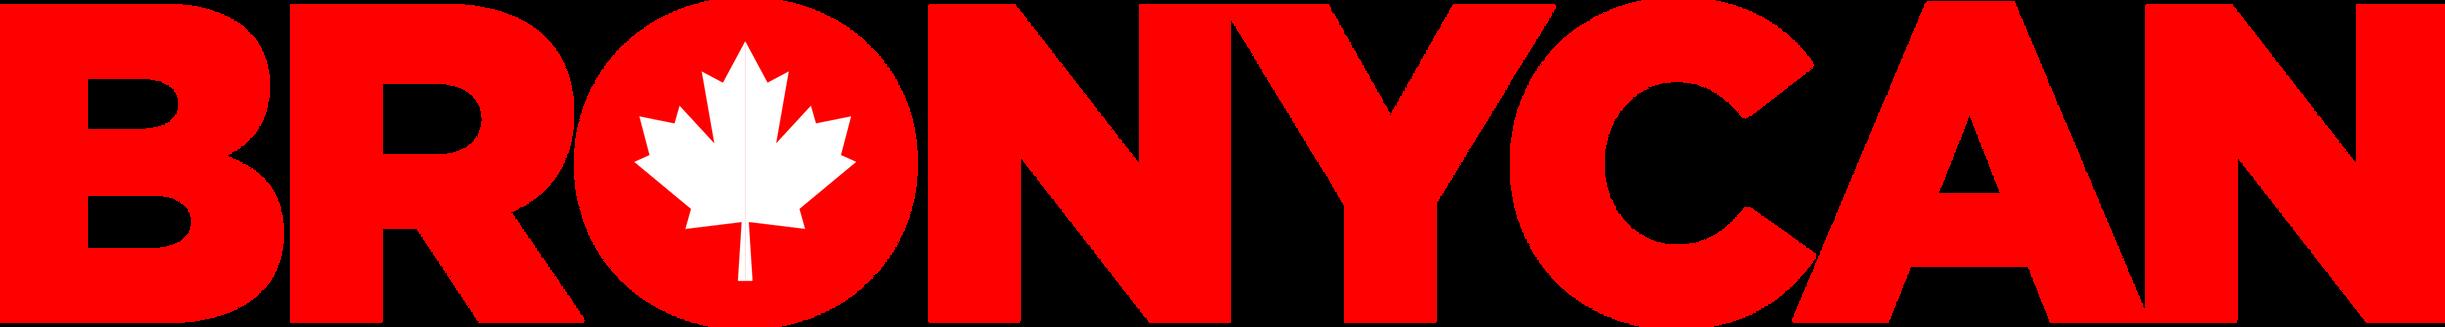 Redesigned BronyCAN Logo